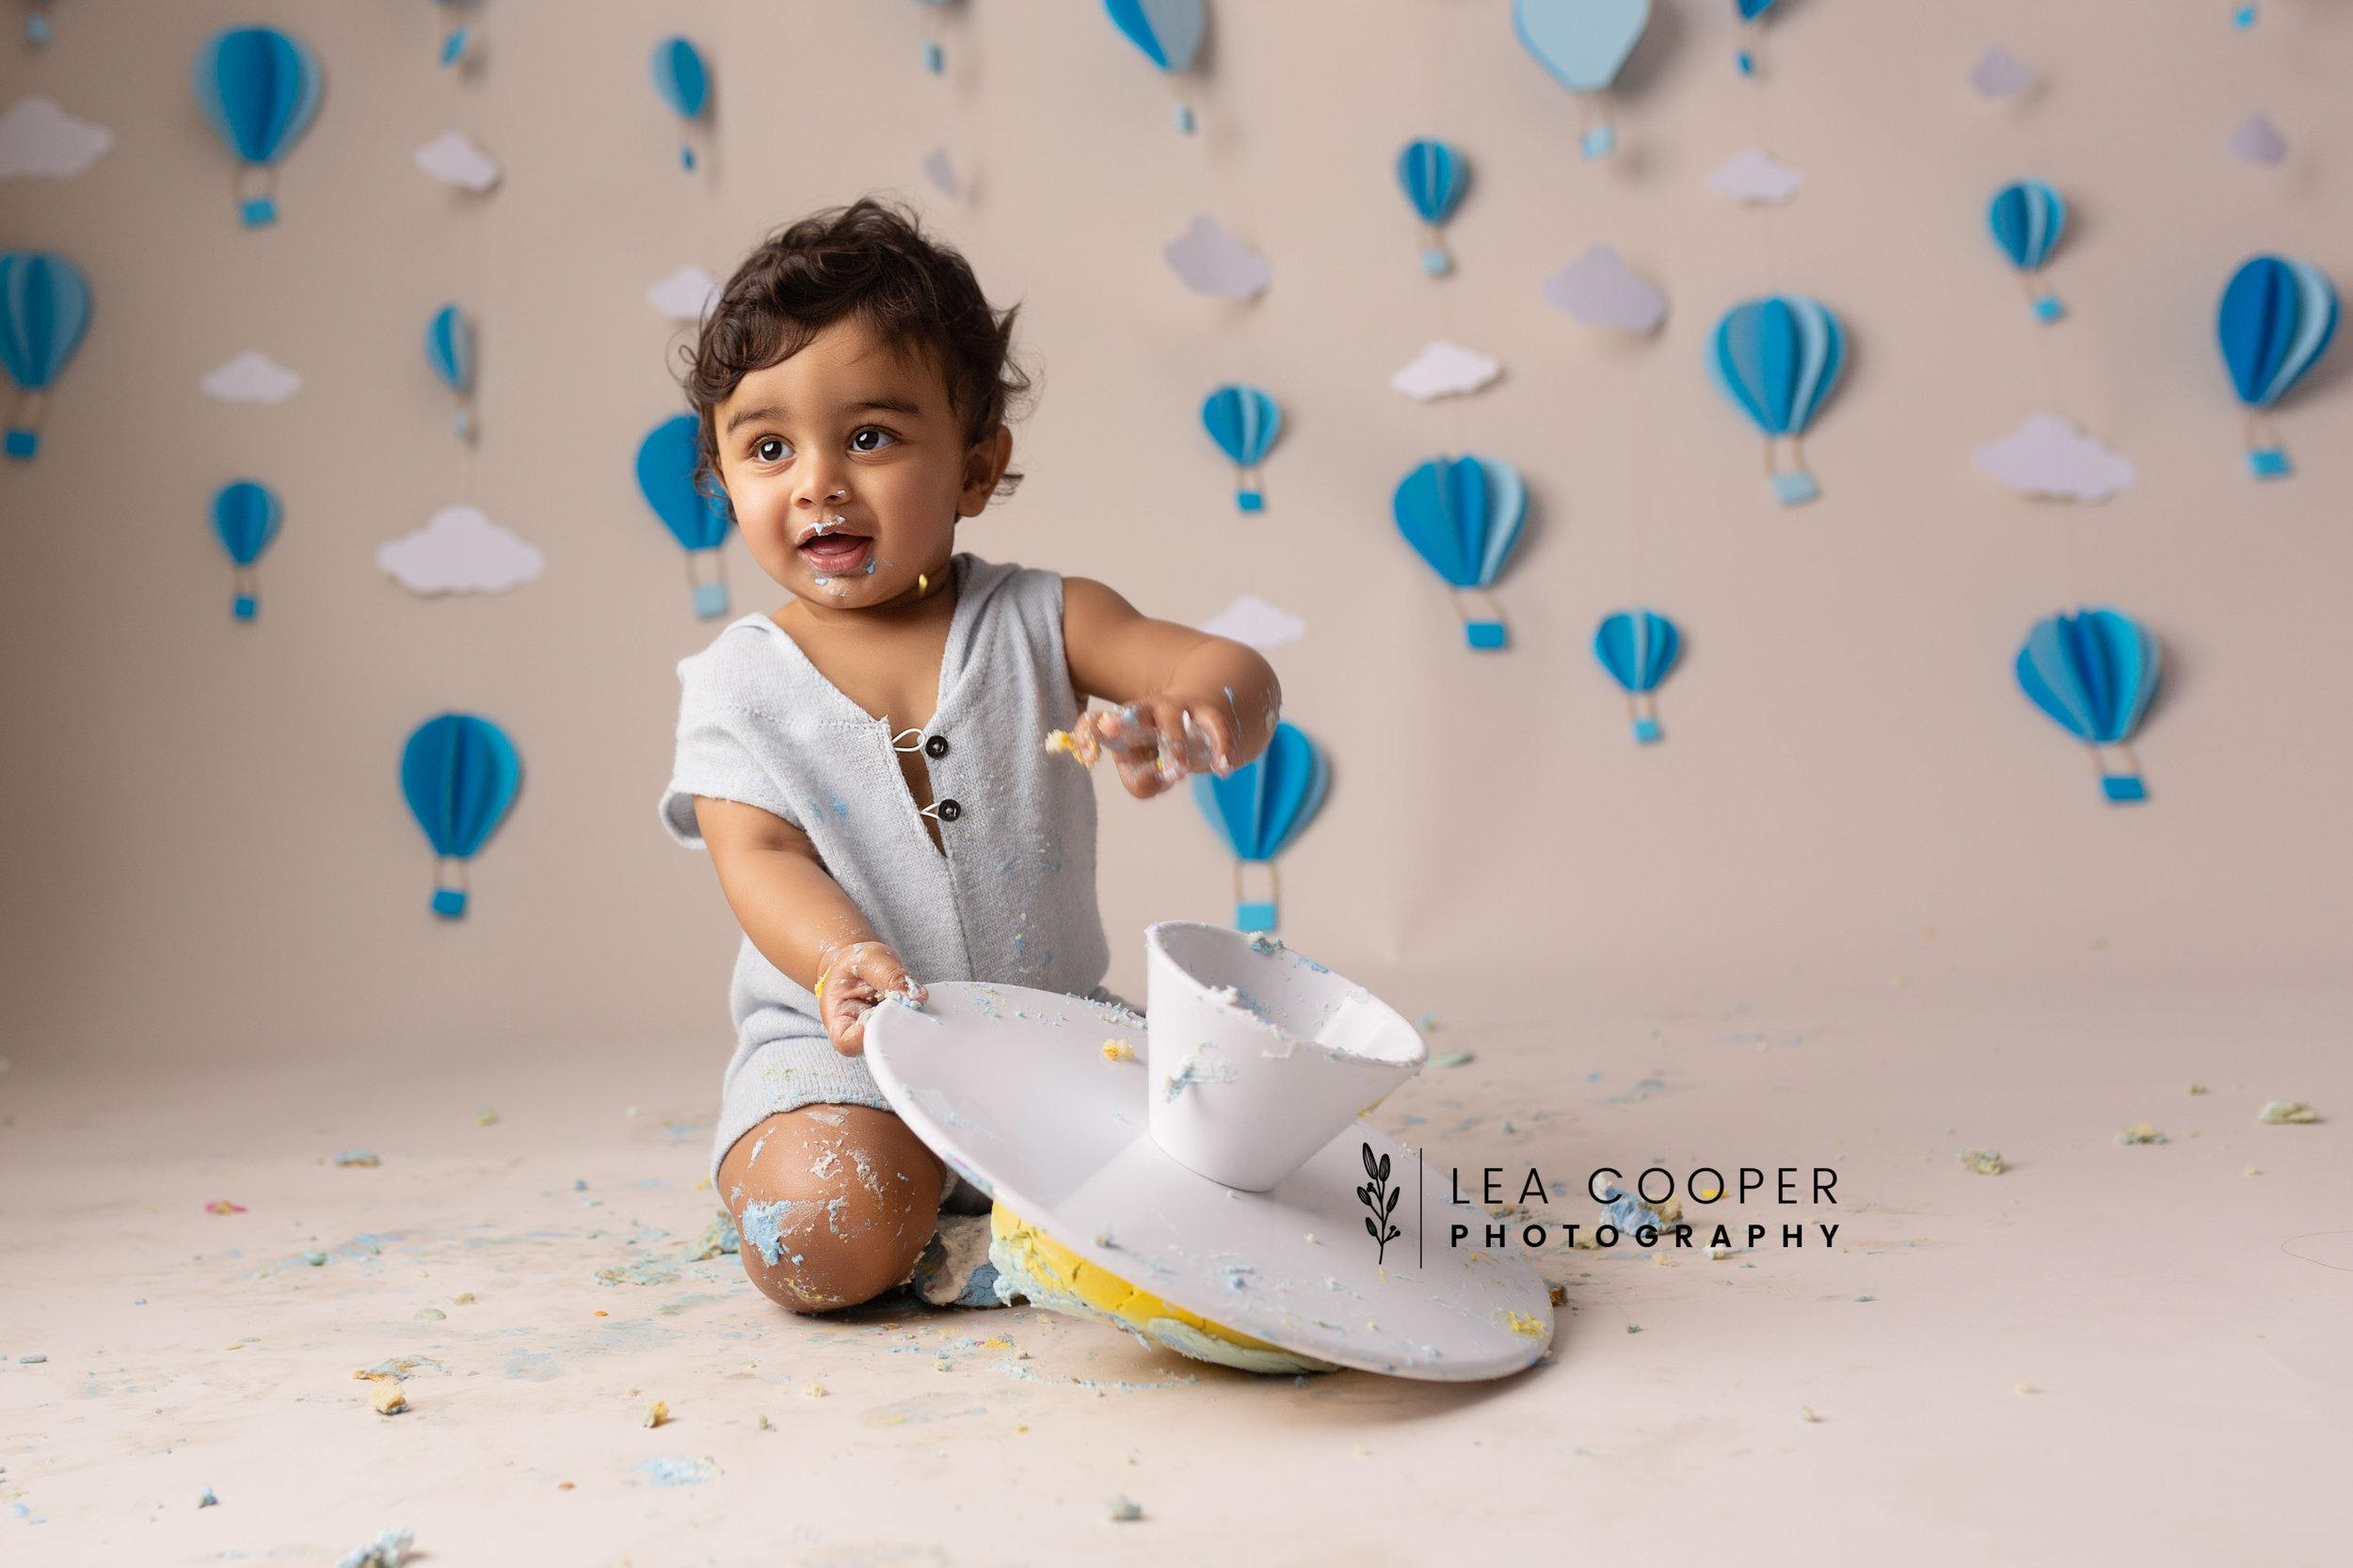 LEA-COOPER-PHOTOGRAPHY-CAKE-SMASH-PHOTOGRAPHER-WILLENALL-WOLVERHAMPTON-CHILD-PHOTOSHOOT-1ST—BIRTHDAY-PICTURES-WEDNESBURY-WALSALL-DUDLEY-WEST-MIDLANDS-UK-31.JPG